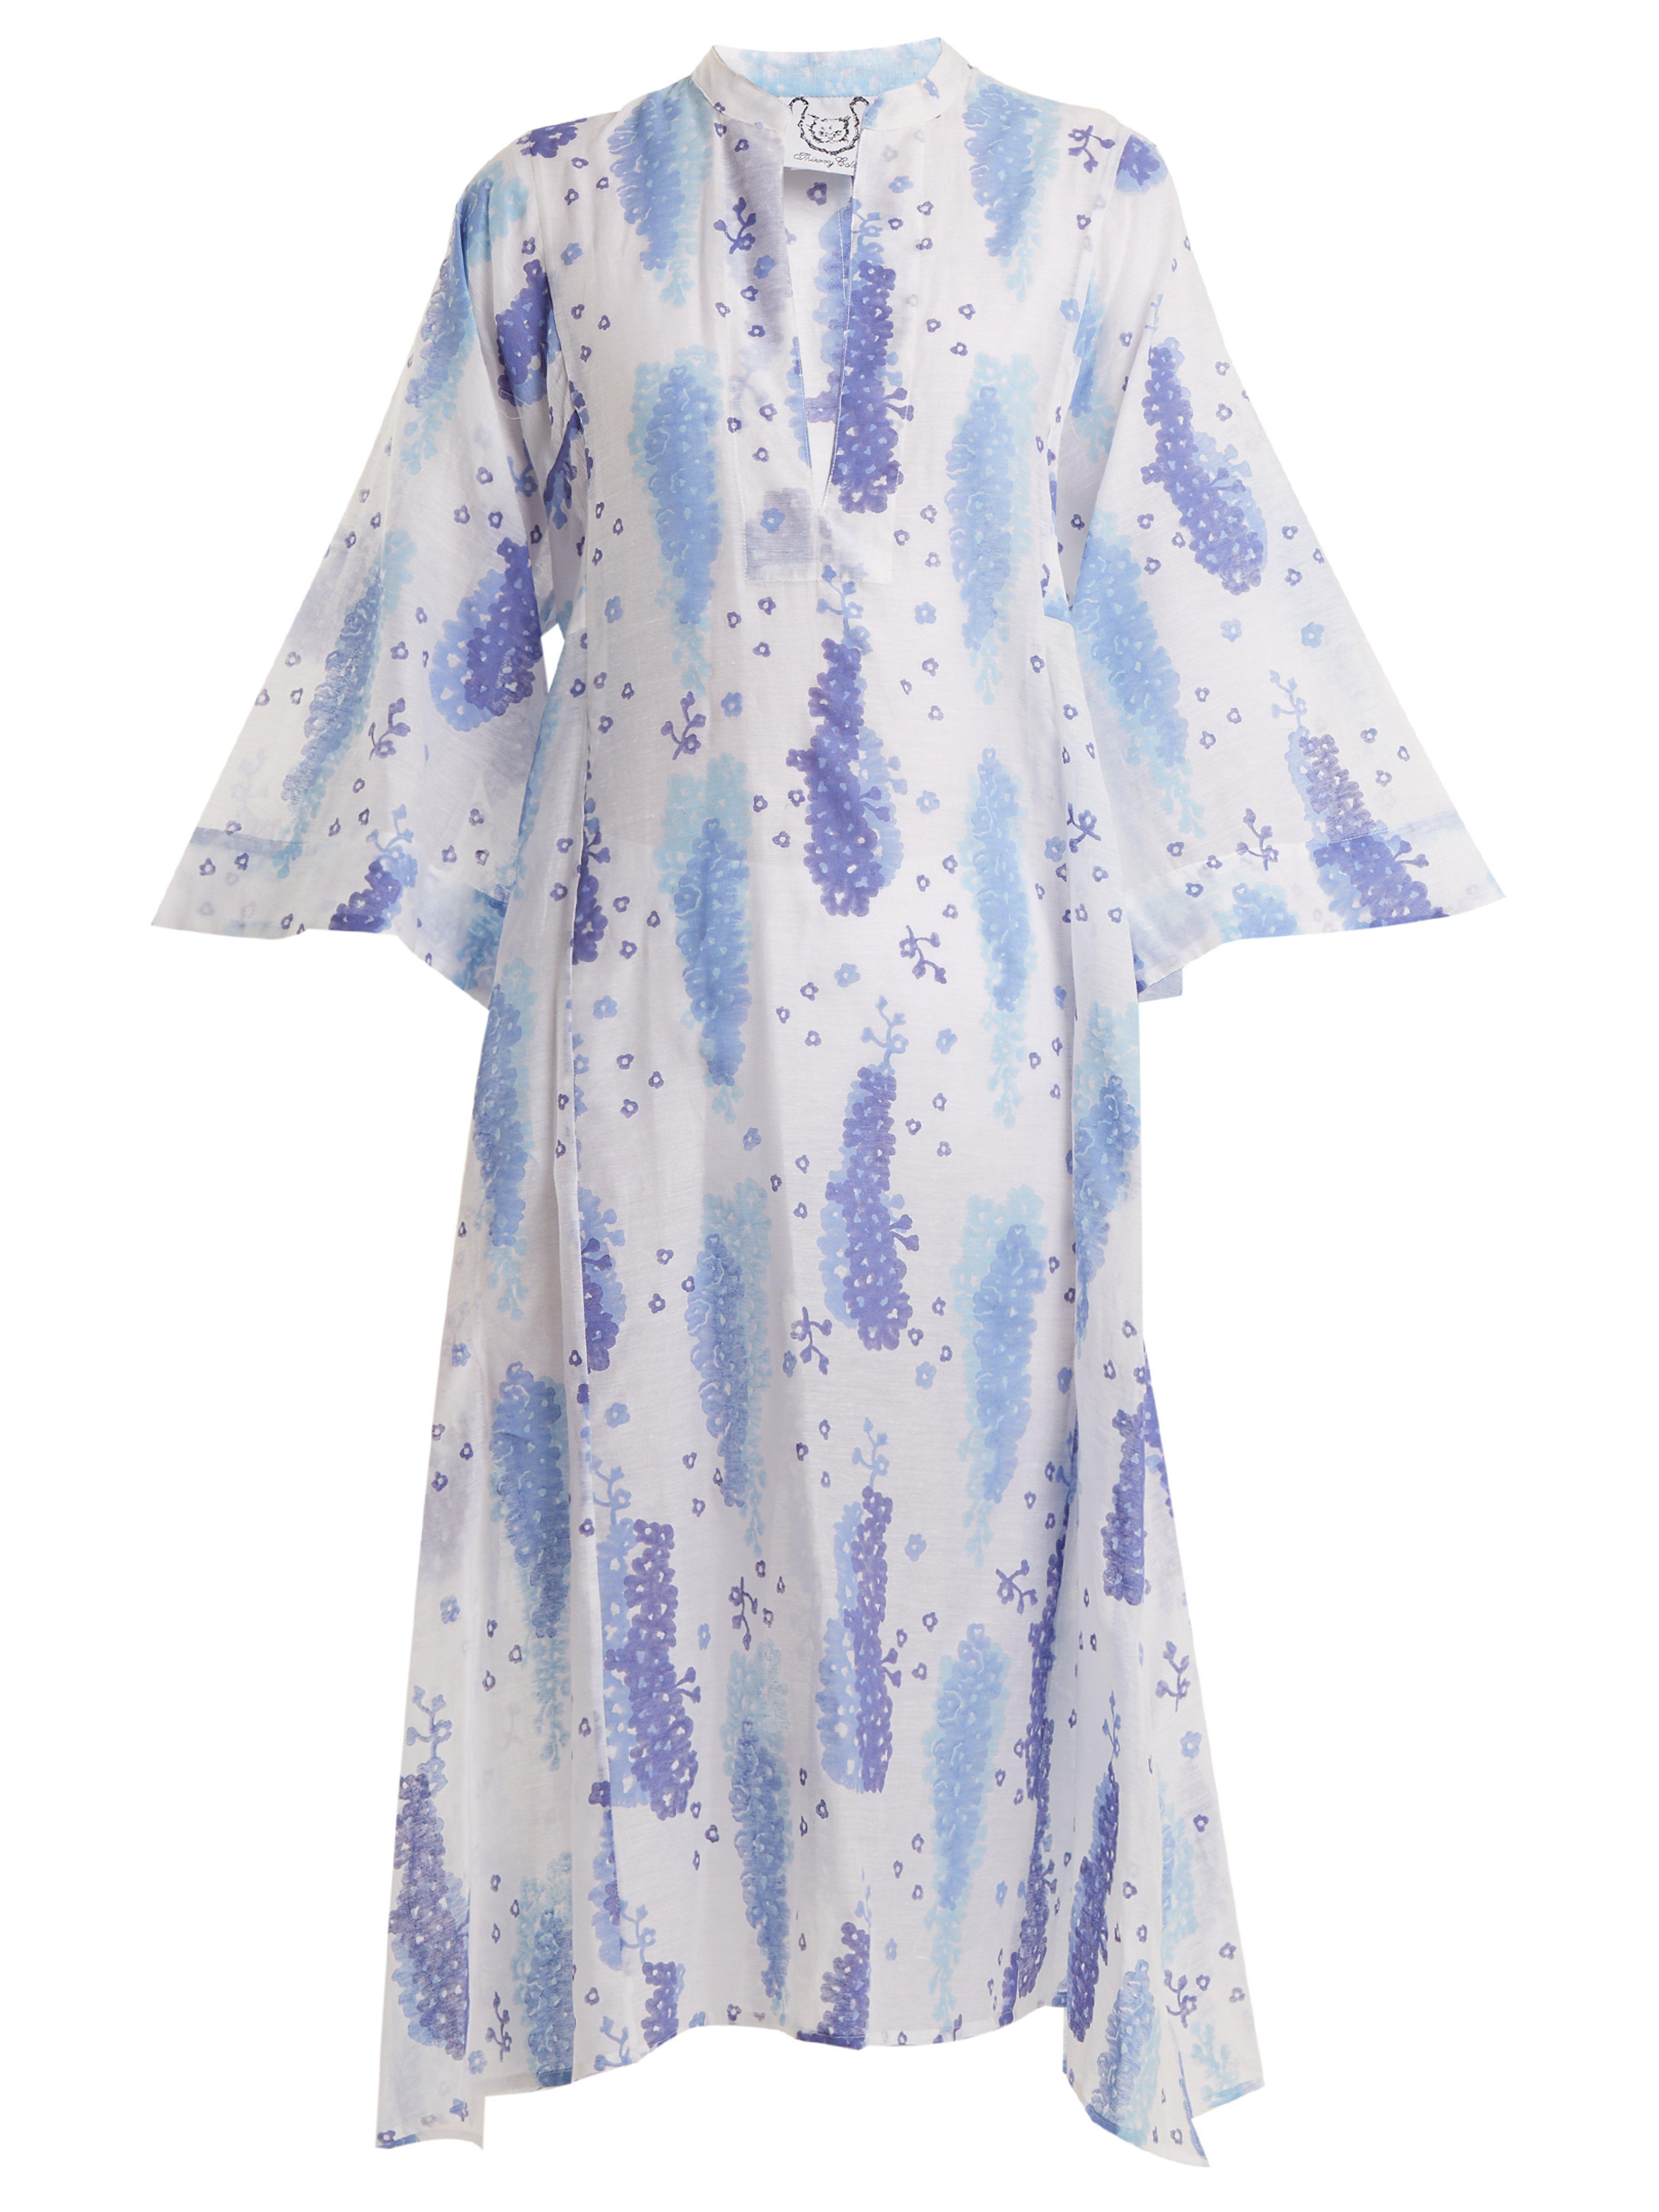 b818dfded5 Thierry Colson Rachel Floral Print Silk Blend Kaftan in Blue - Lyst